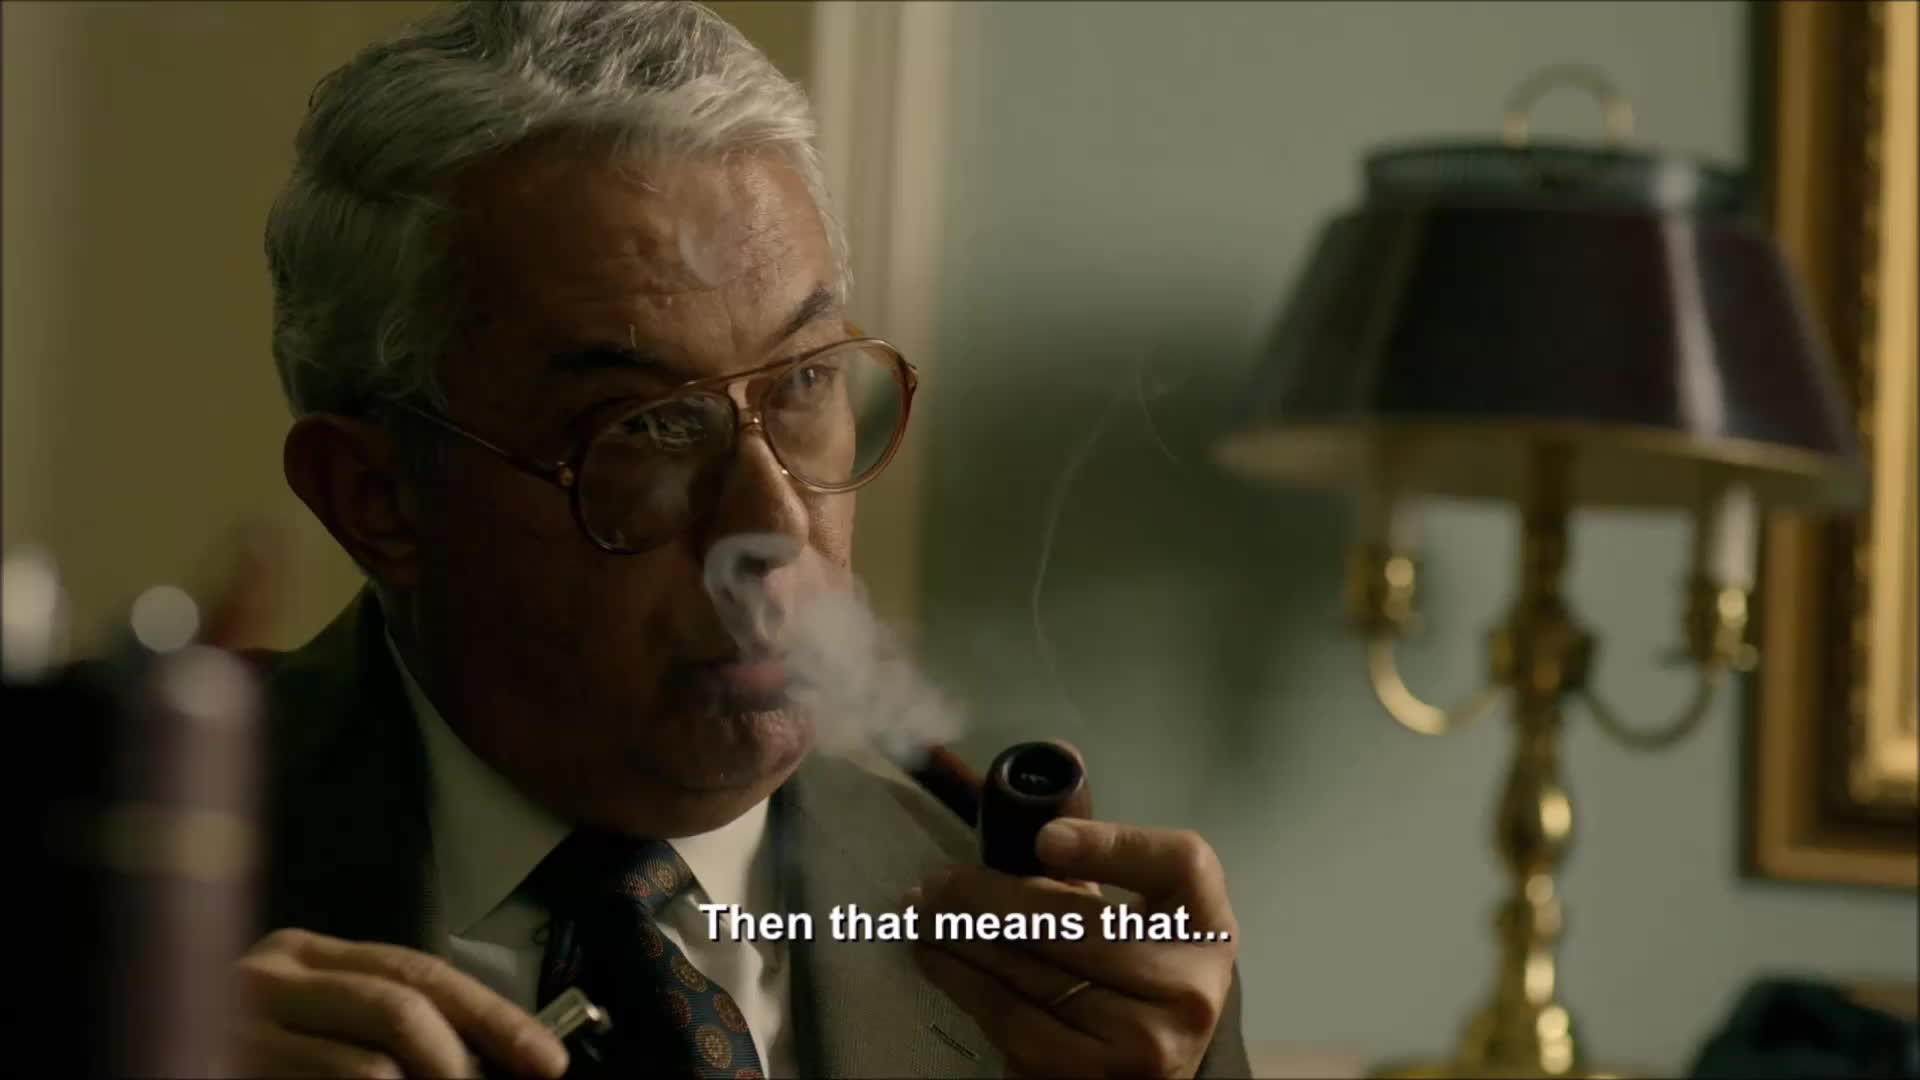 narcos, Episode Discussion: Season 2 Episode 2 (reddit) GIFs